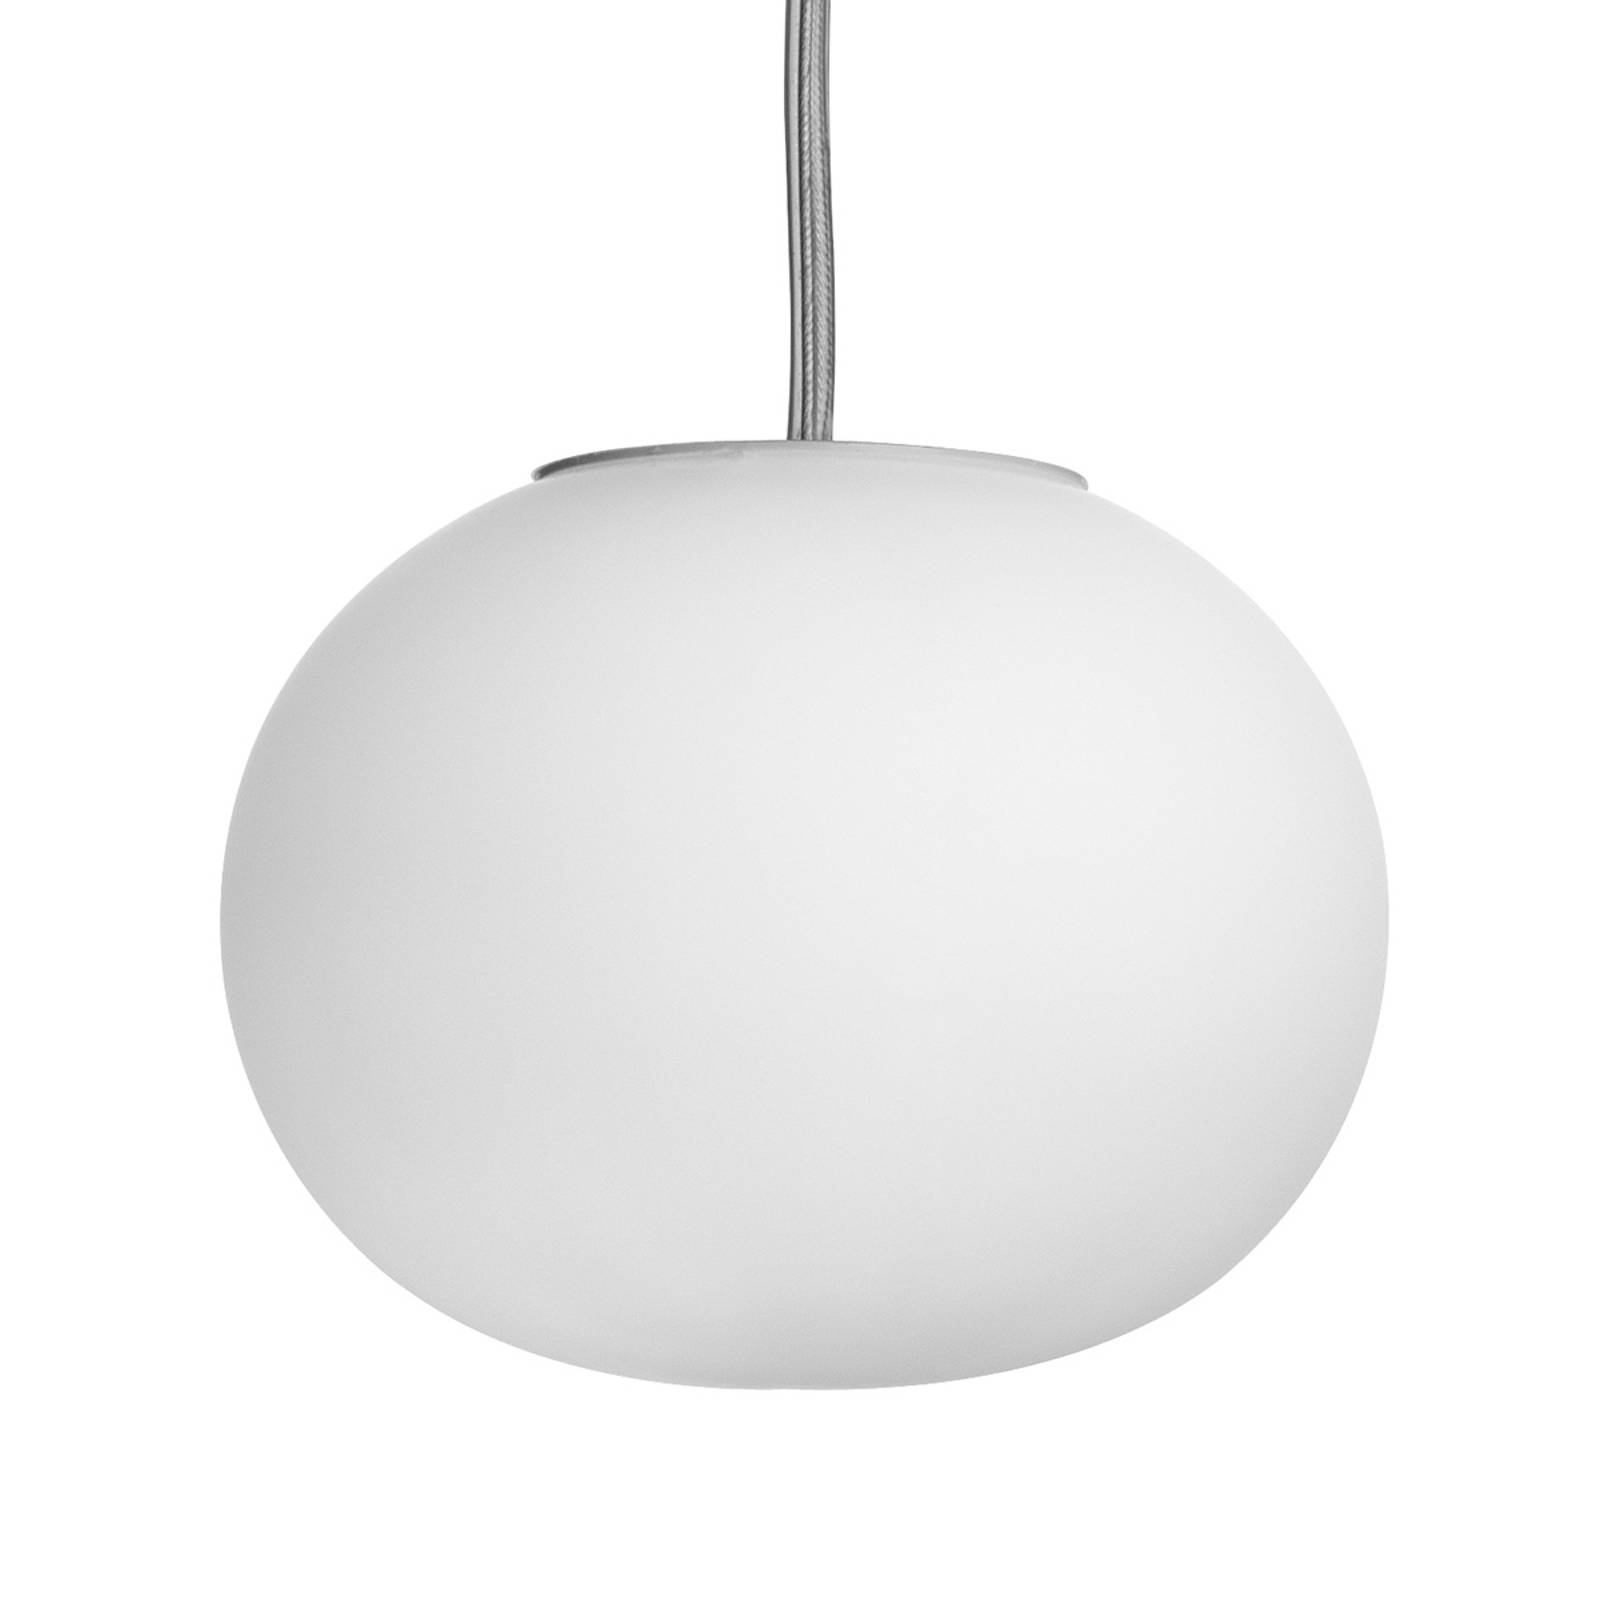 FLOS Mini Glo-Ball S - kugelförmige Hängeleuchte